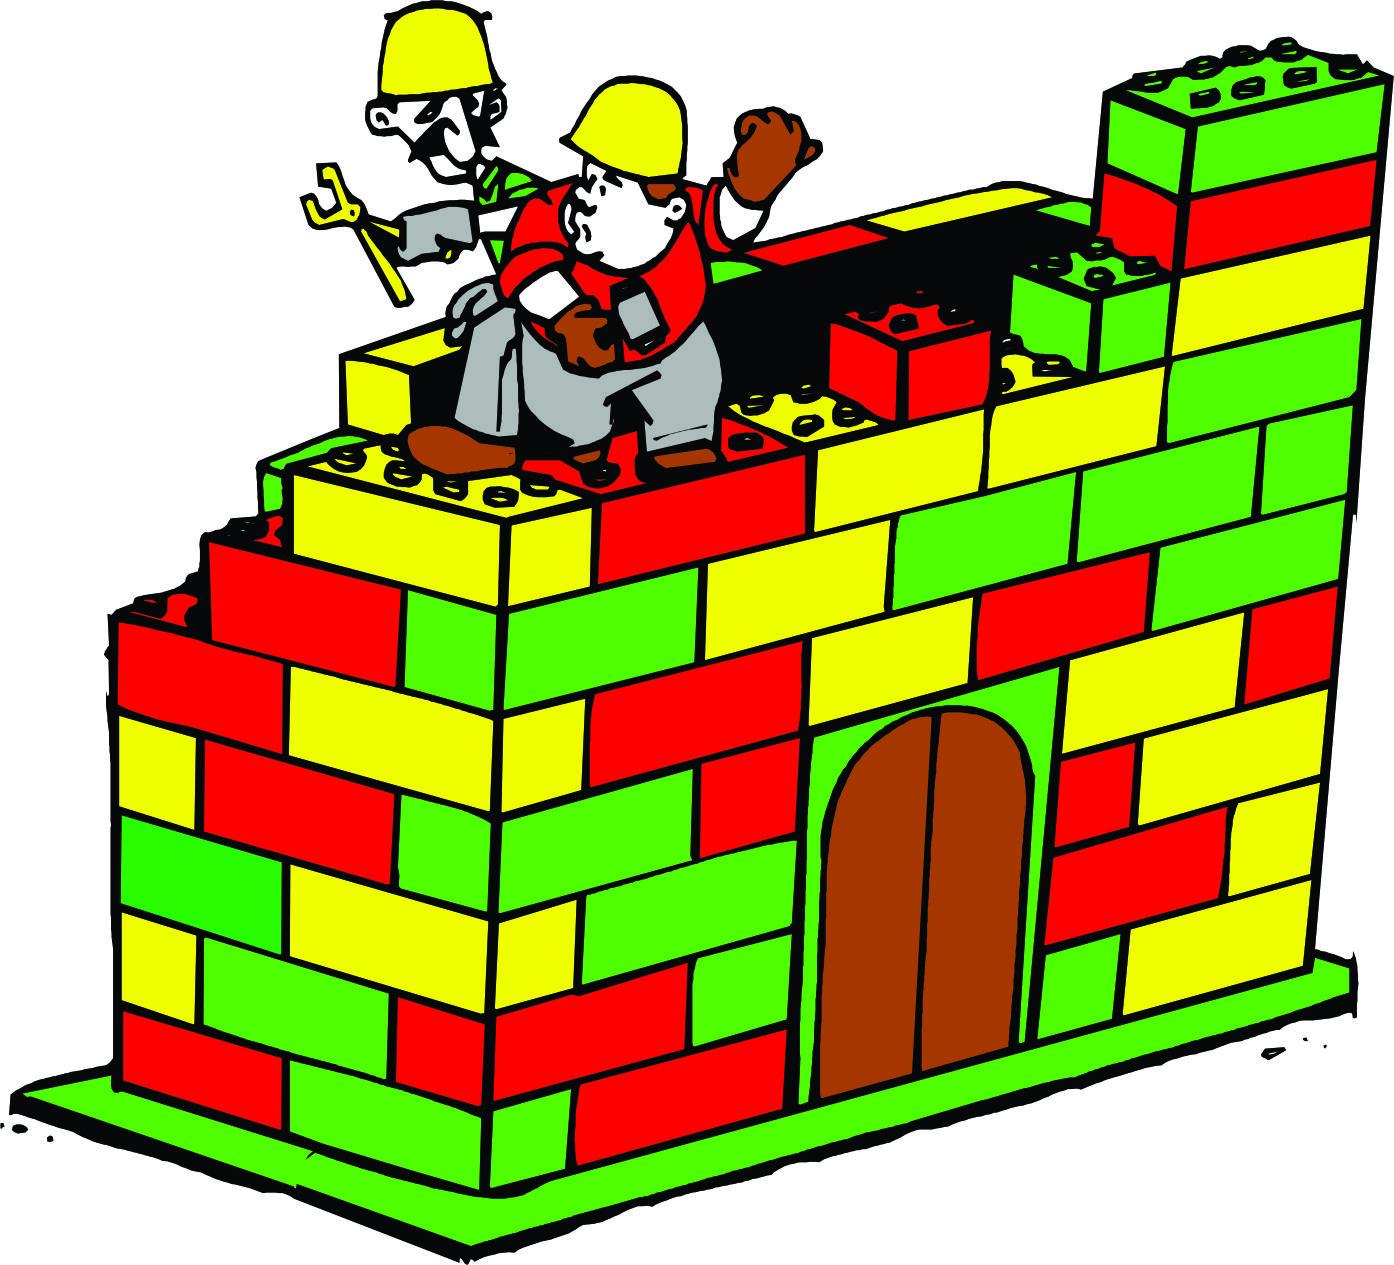 Lego building blocks clipart download Lego blocks clip art - ClipartFest download